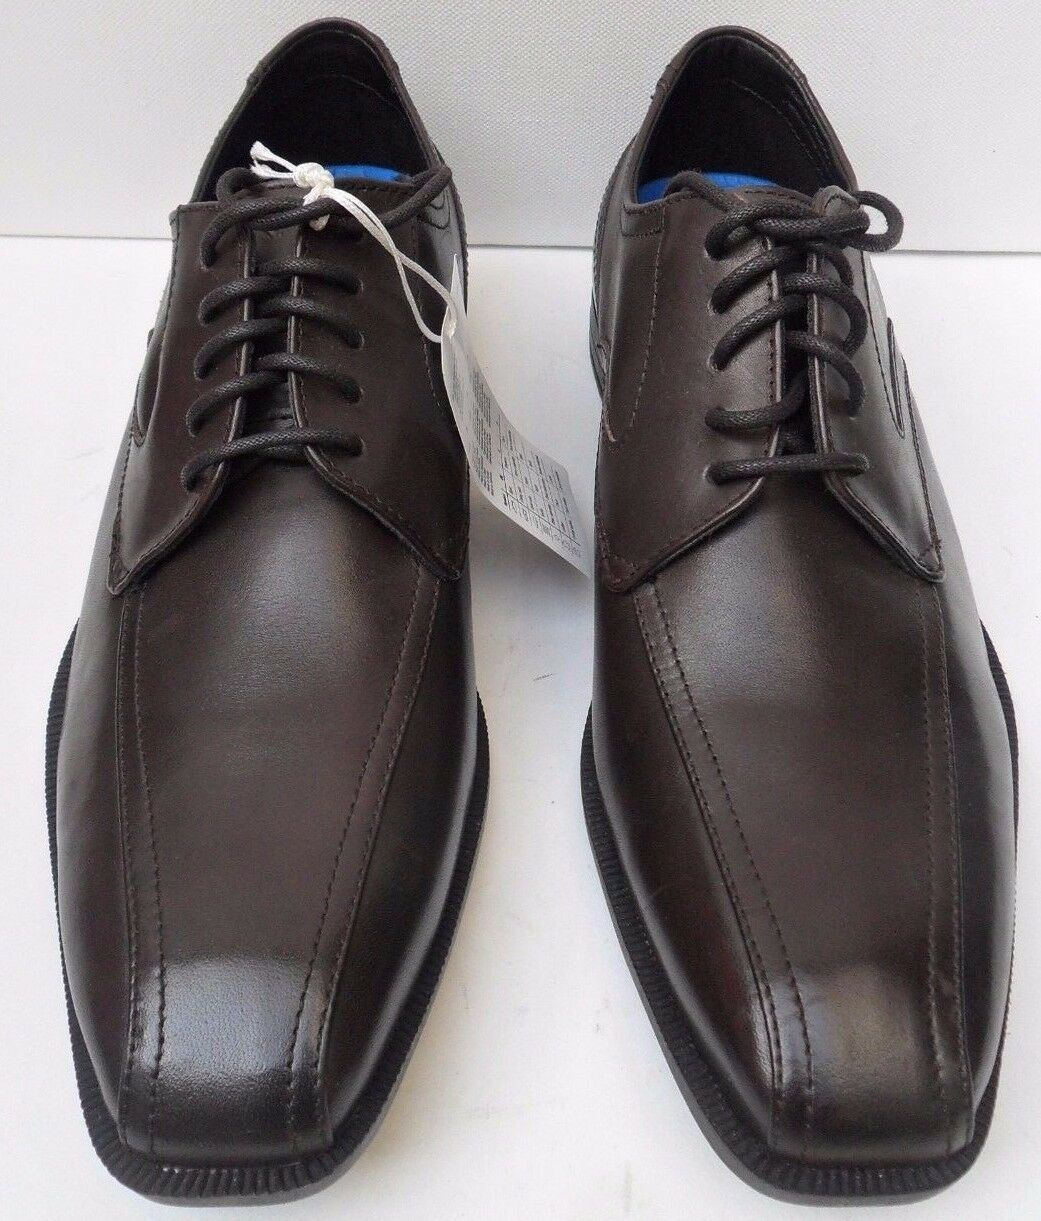 Mens Rockport Brown Leather Lace Up Smart Dress Shoes - Size UK 6 EUR 39